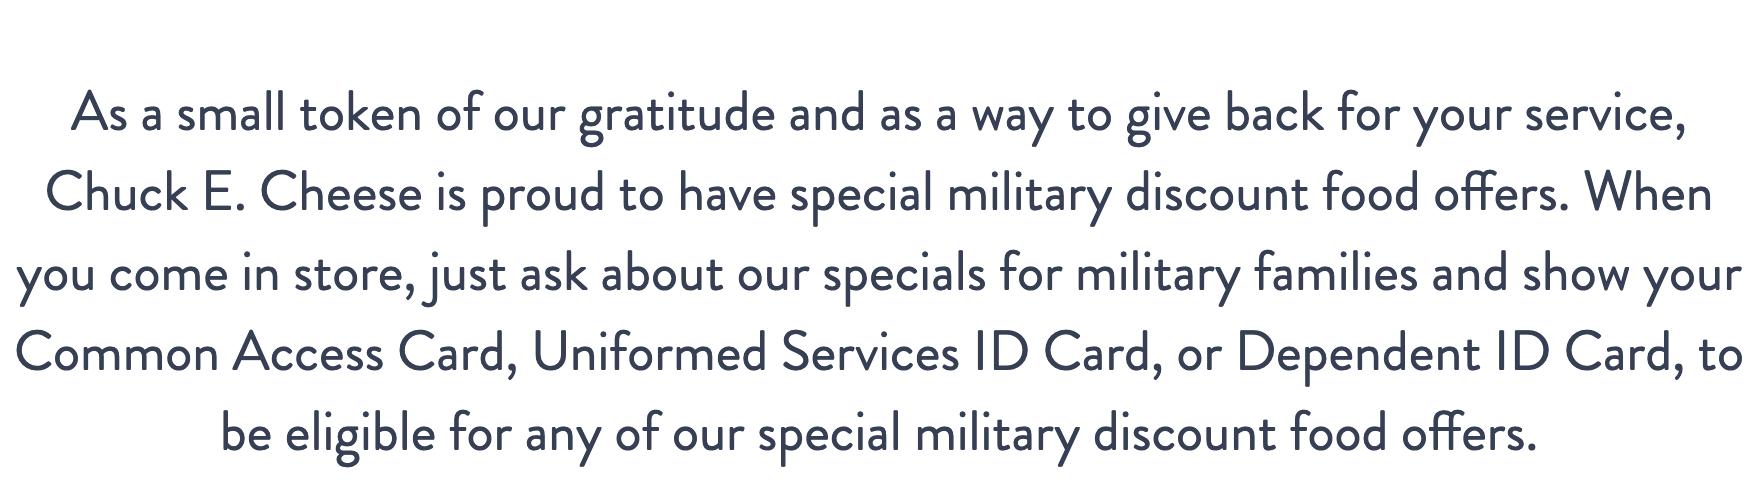 Chuck E. Cheese Military Veteran Discounts